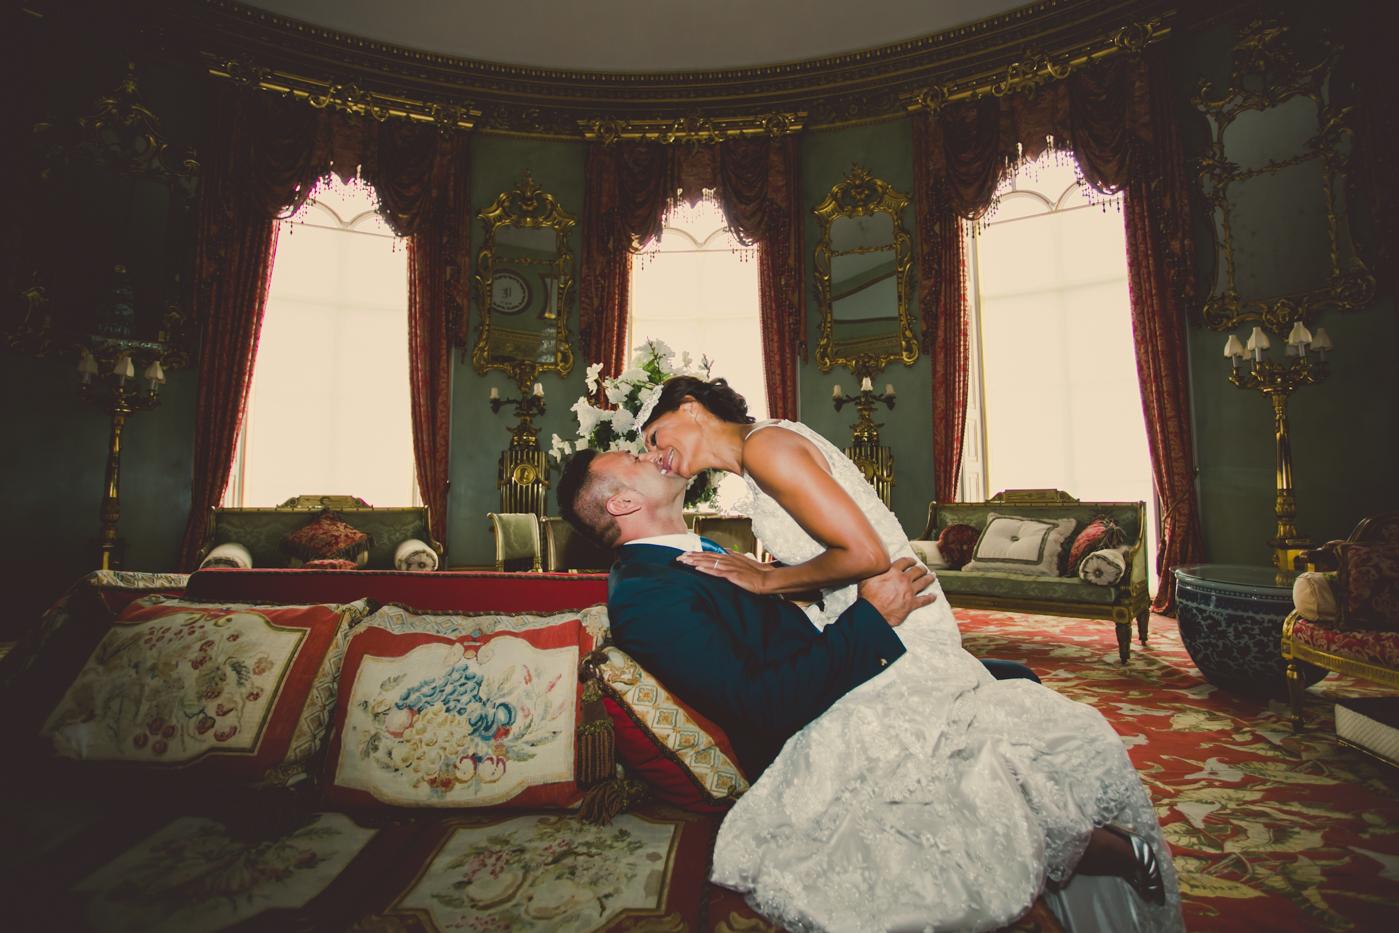 115 Donna and John Wedding Photography at Belvoir Castle www.belvoircastle.com UK by Mark Pugh.JPG